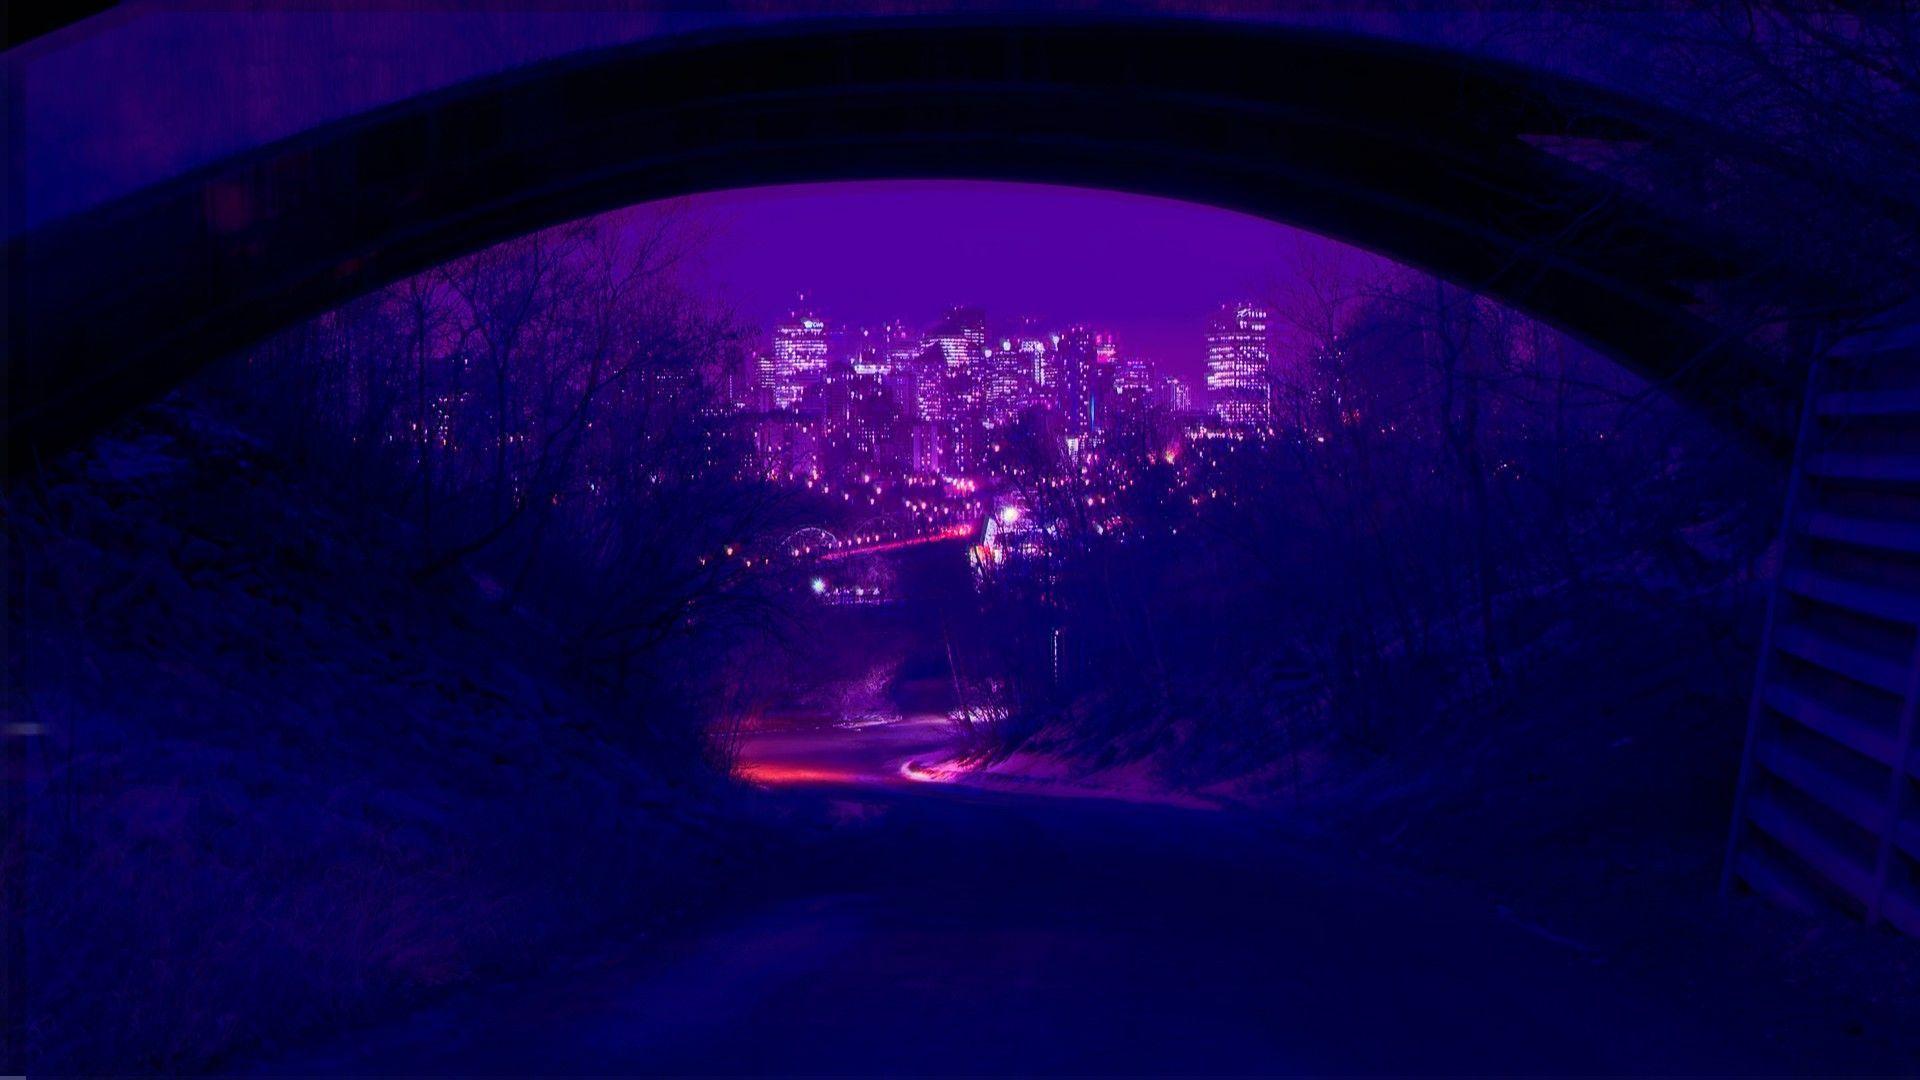 Purple Grunge Aesthetic Desktop Wallpapers   Top Purple 1920x1080